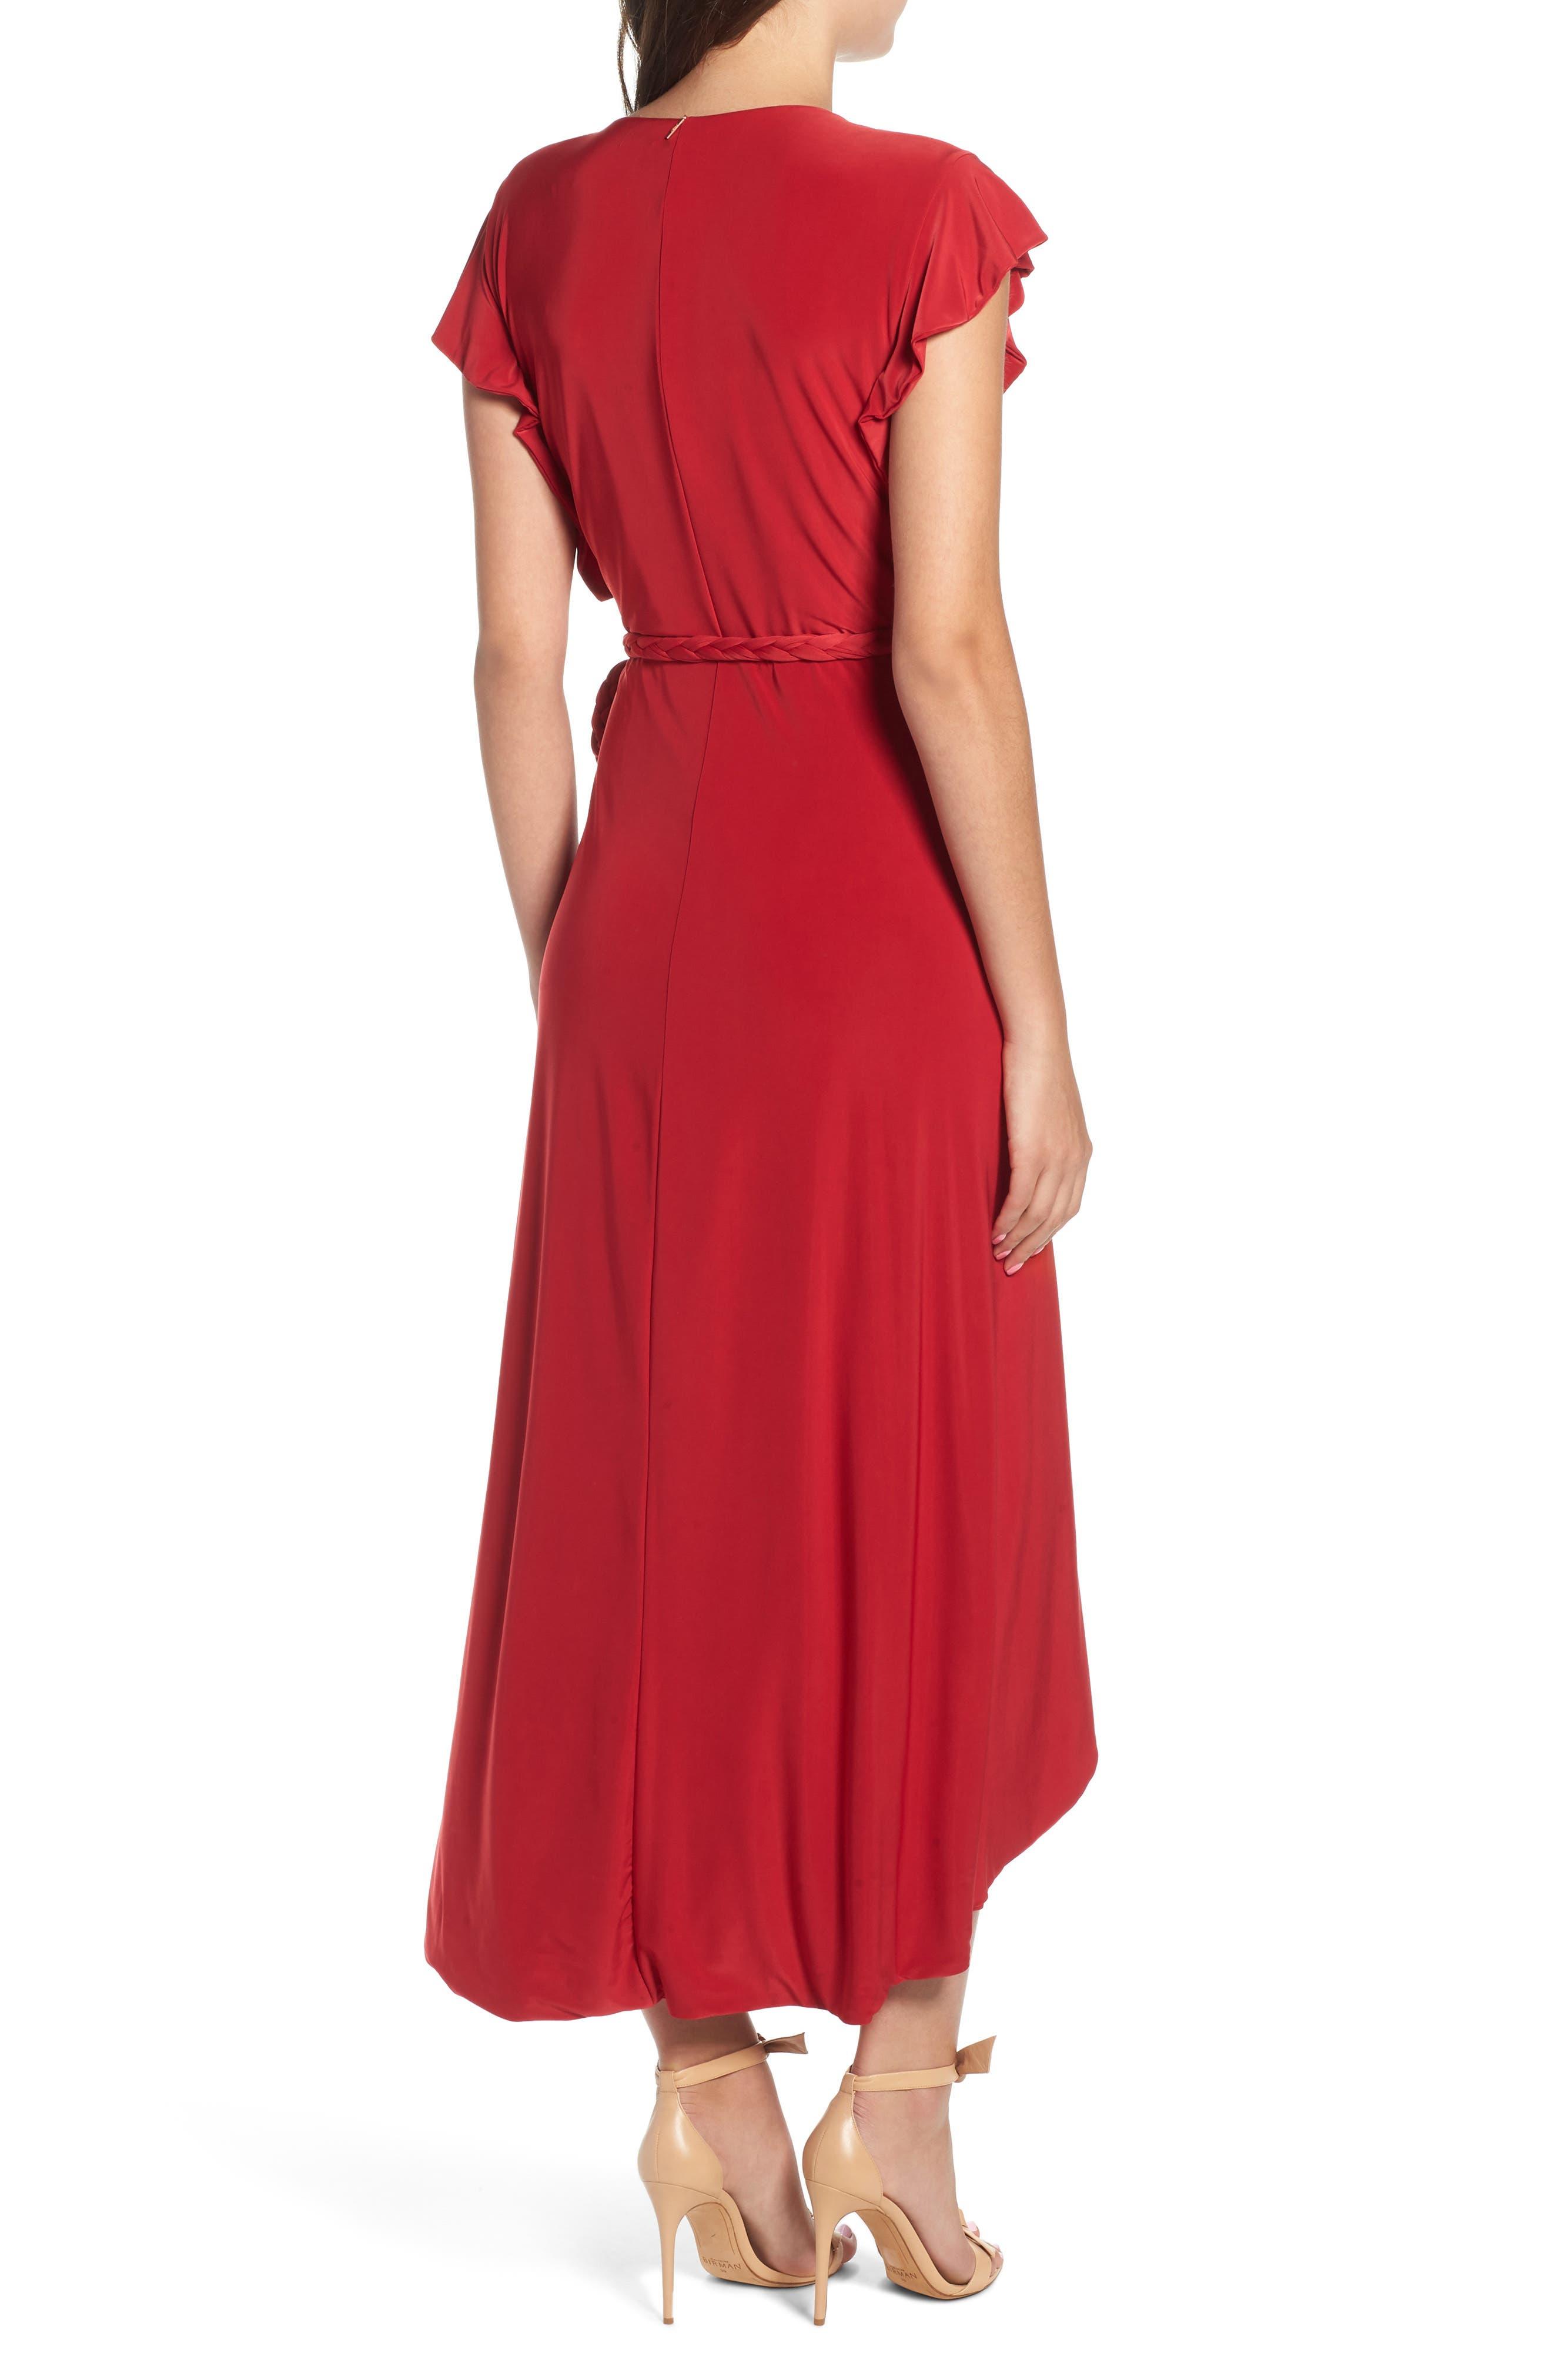 MISA LOS ANGELES, Irina Dress, Alternate thumbnail 2, color, RED